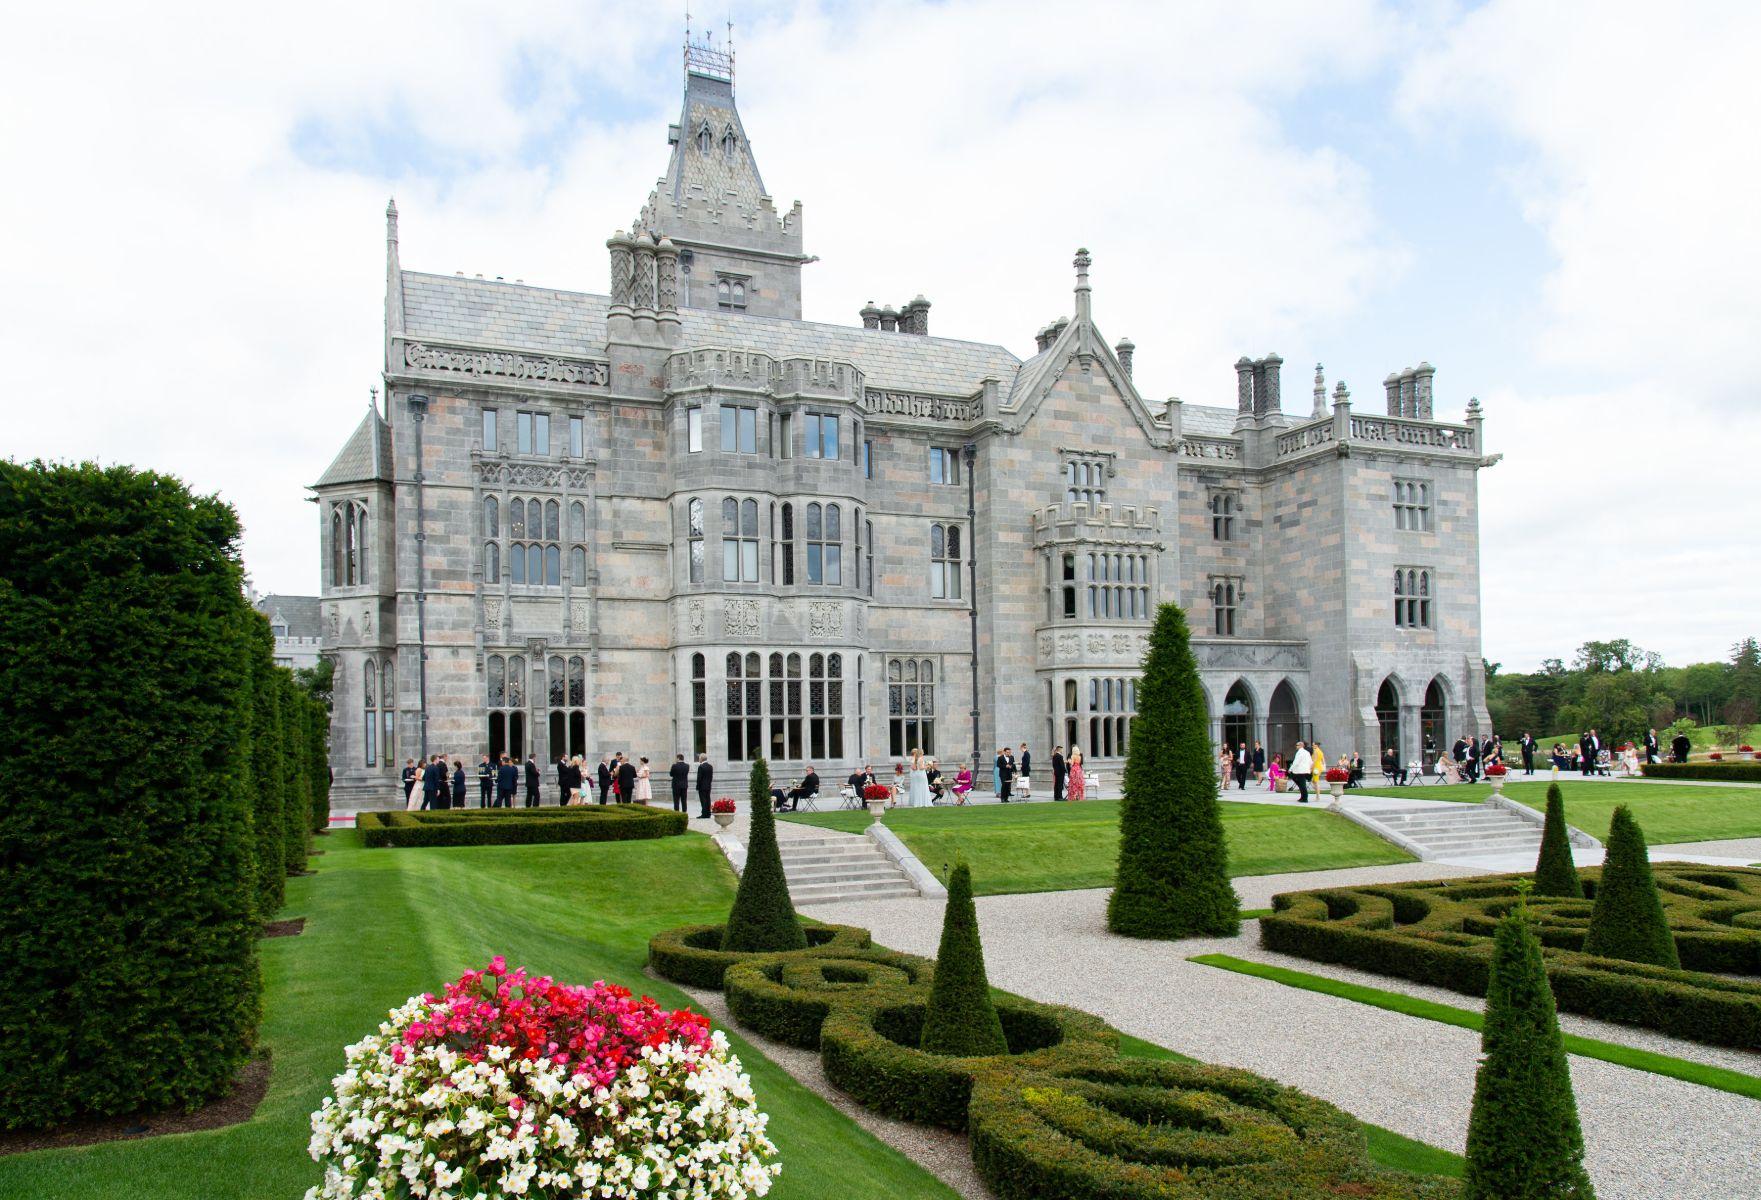 Adare Manor in Ireland, a castle.